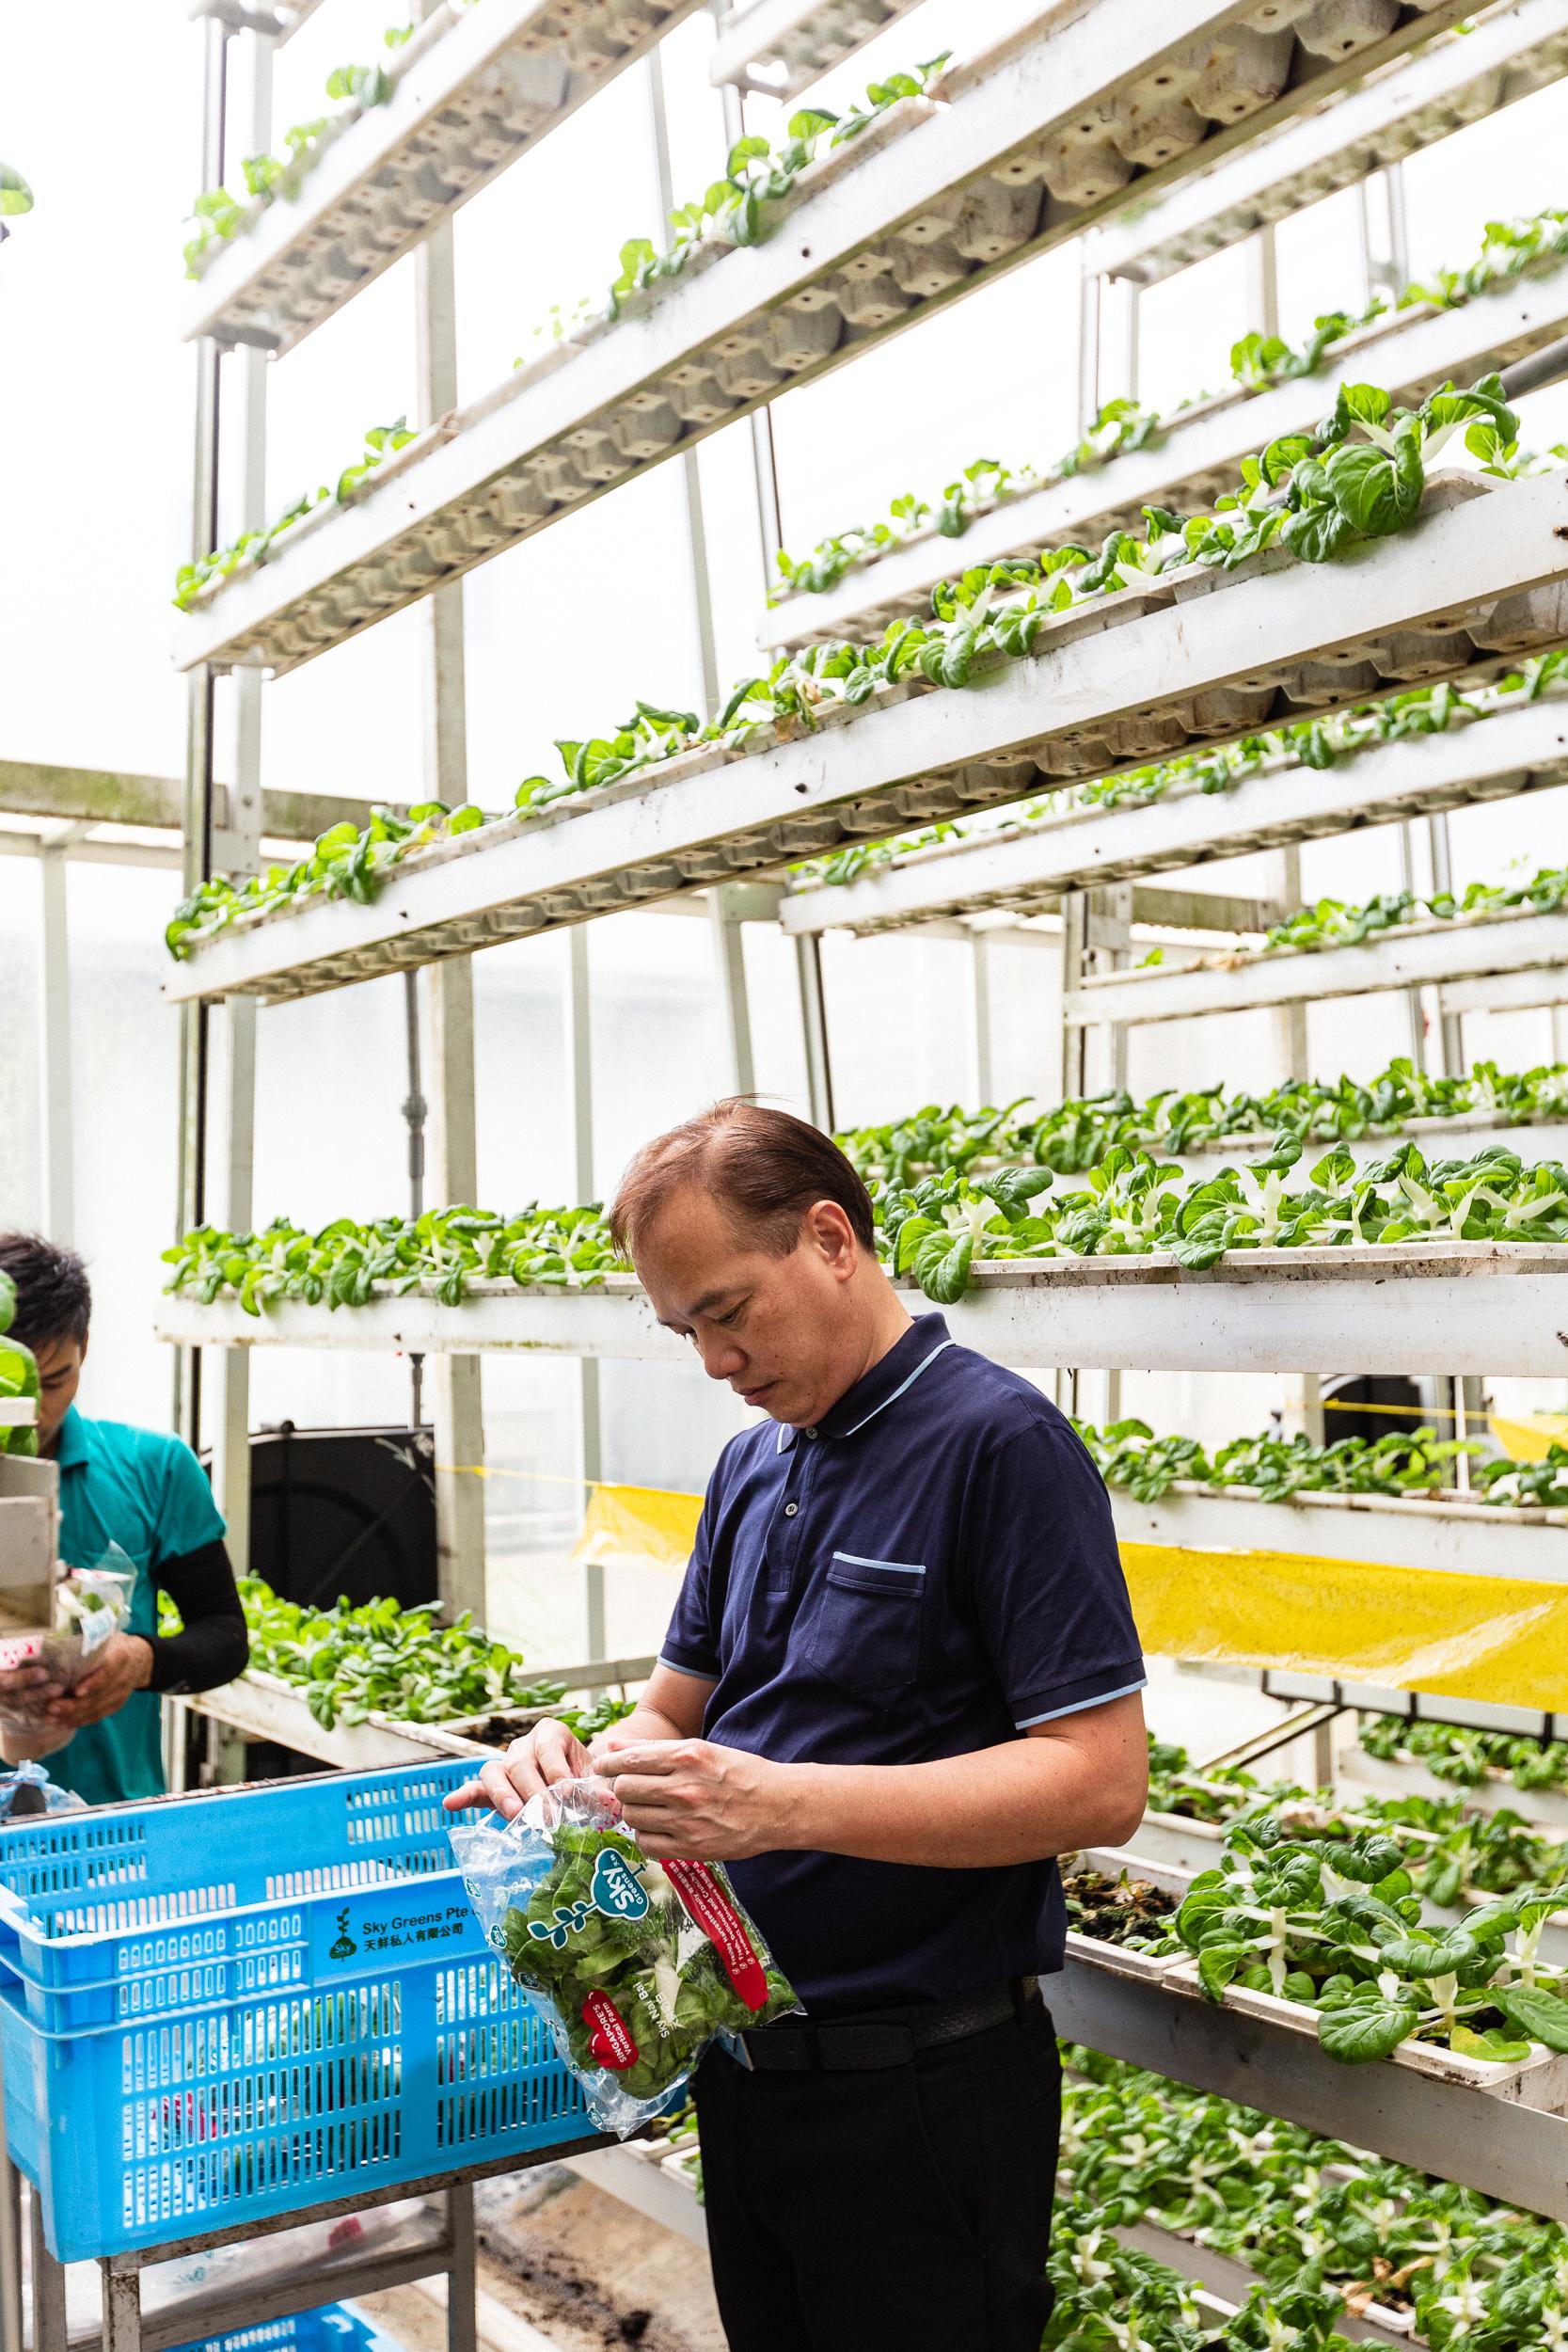 singapore-commercial-editorial-photographer-zainal-zainal-vertical-farming-skygreens-pictet-02.jpg